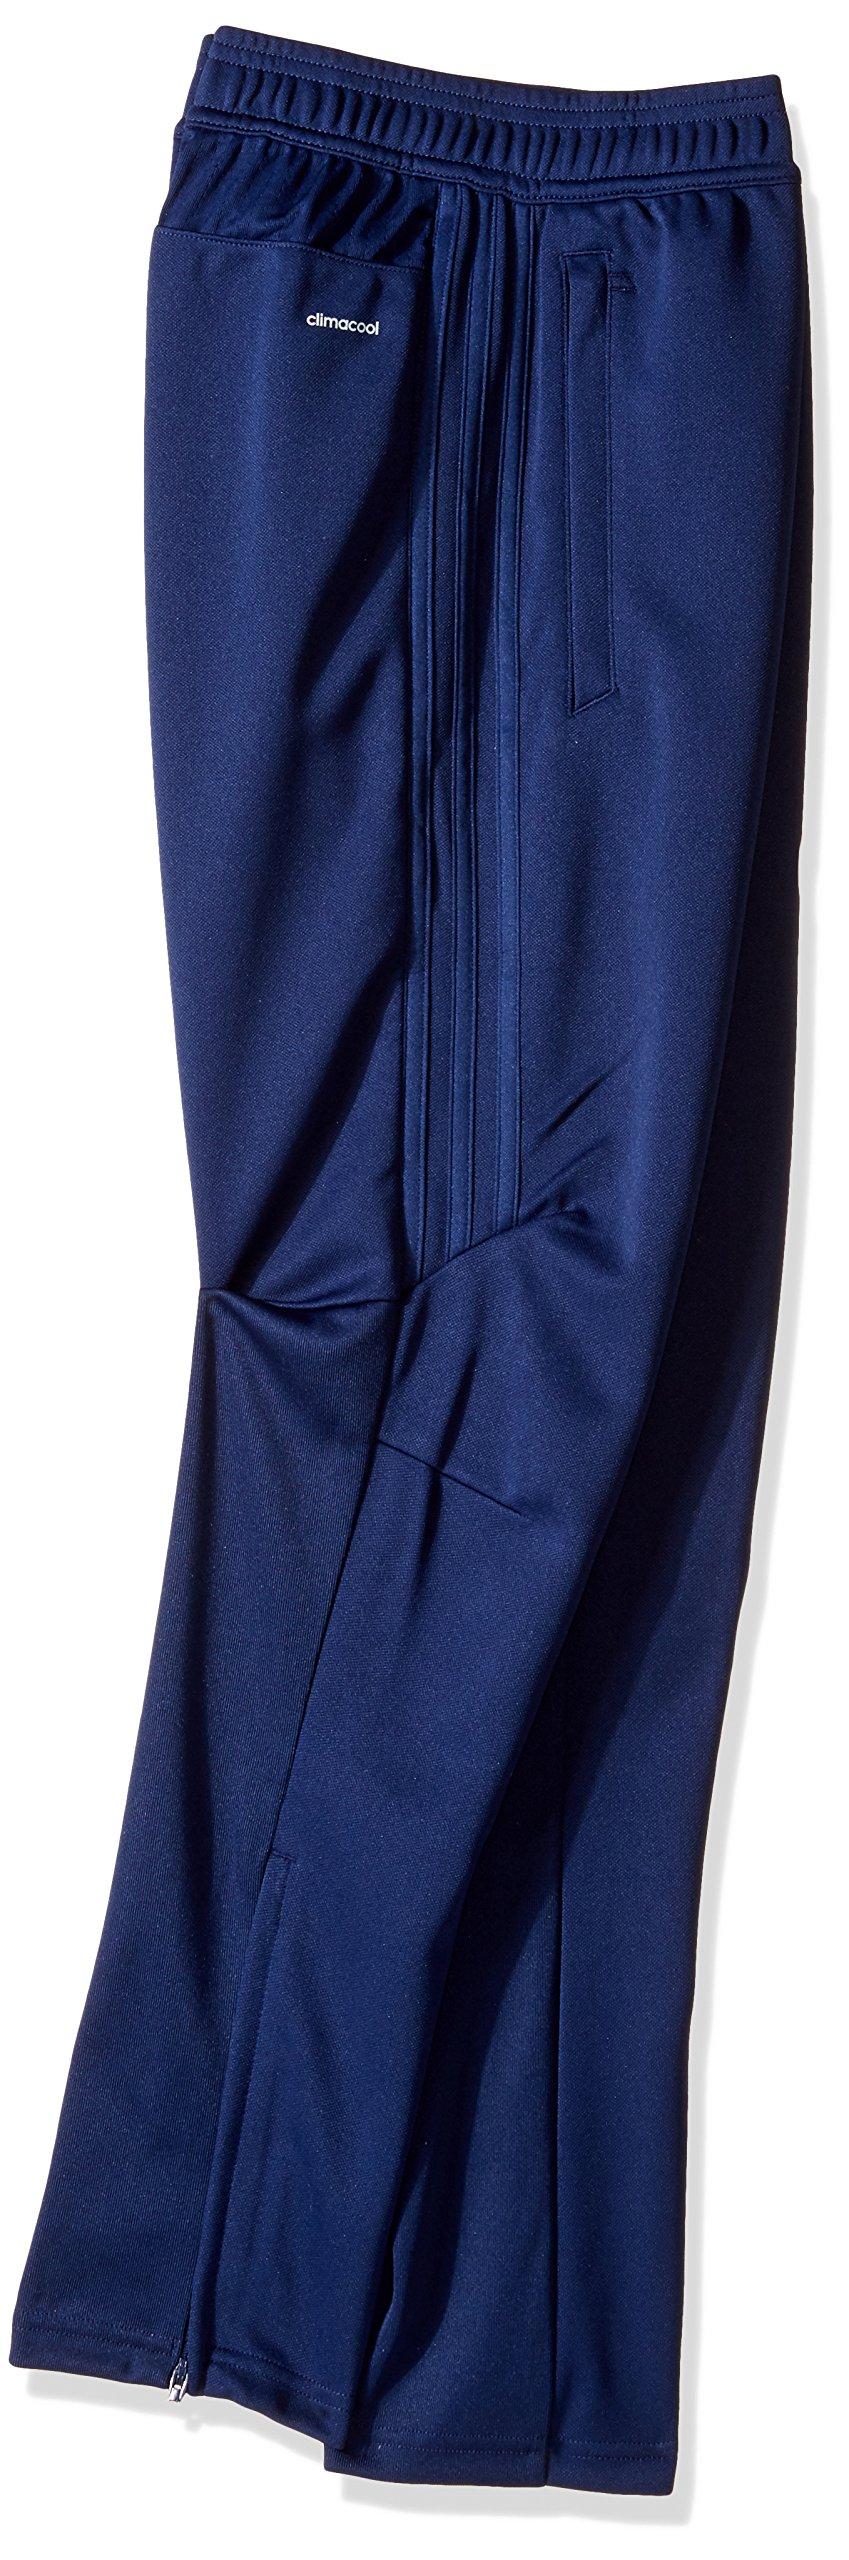 adidas Youth Soccer Tiro 17 Pants, Small - Dark Blue/White by adidas (Image #2)